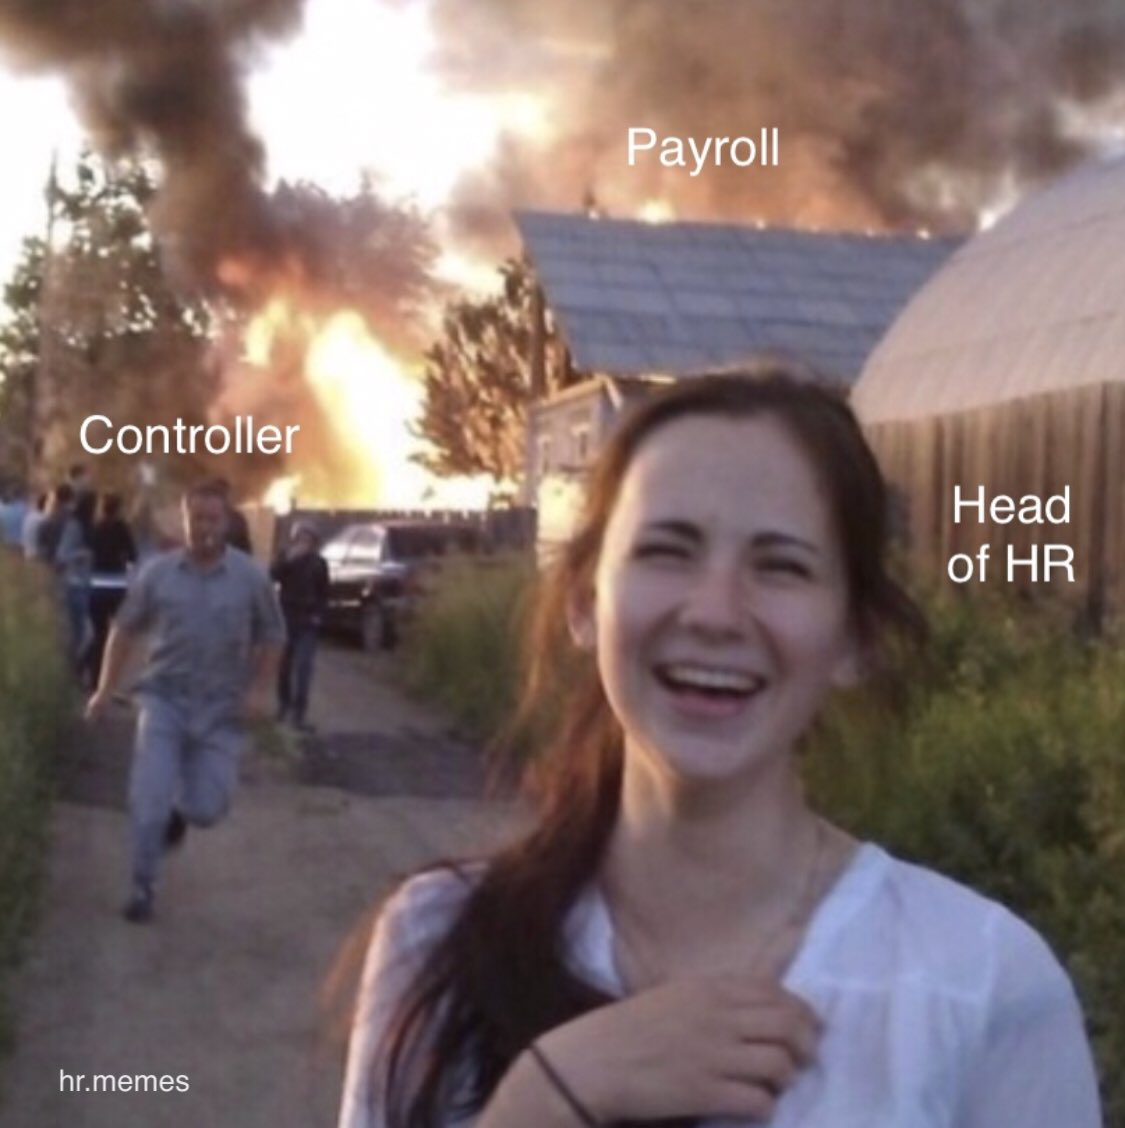 "HR Memes On Twitter: ""#Payroll #NotMyAOR #ItsFinanceJob"